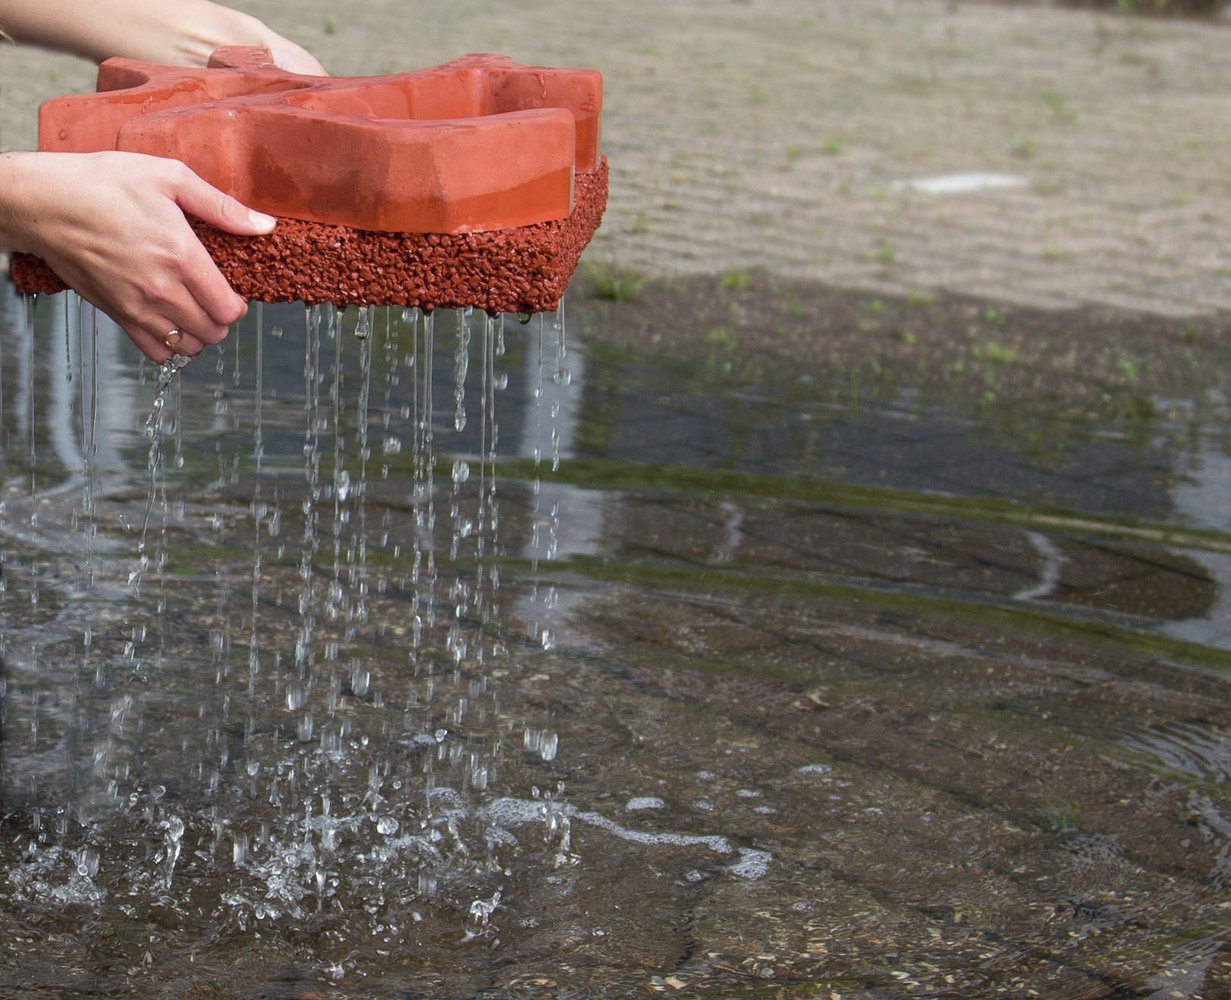 Concreto ultra poroso absorve a água da chuva instantaneamente